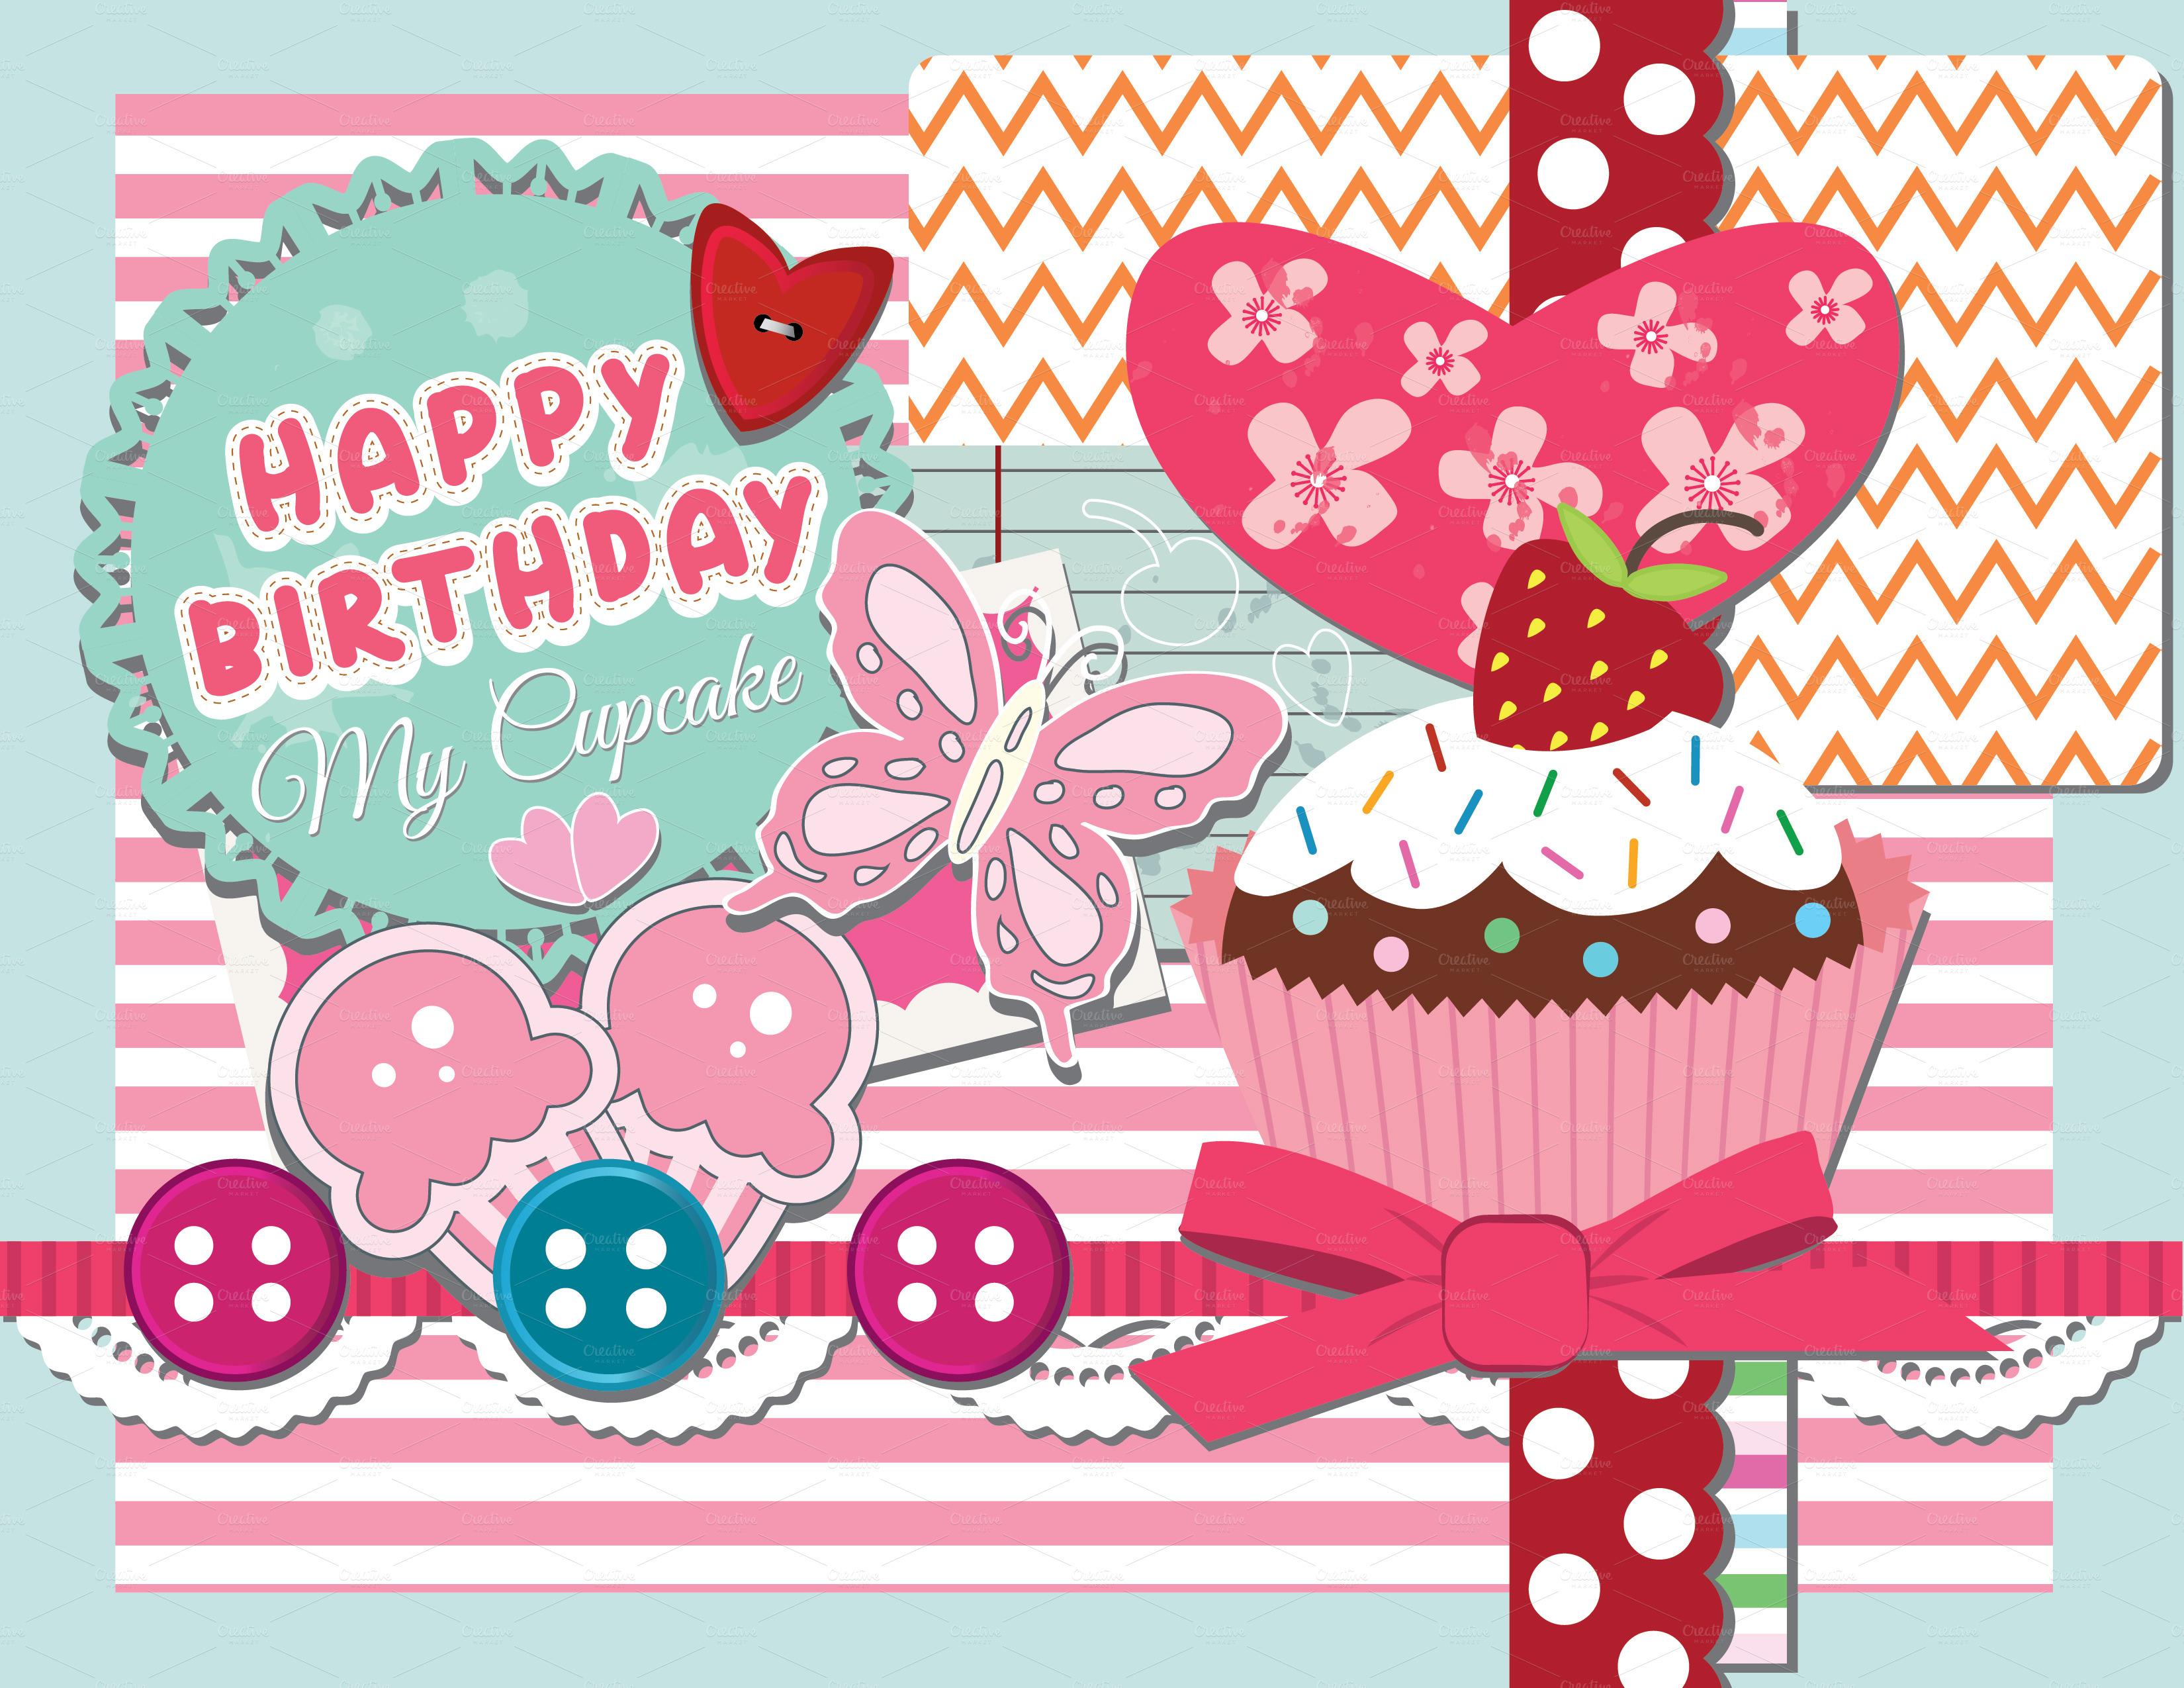 scrapbook happy birthday card  card templates on creative